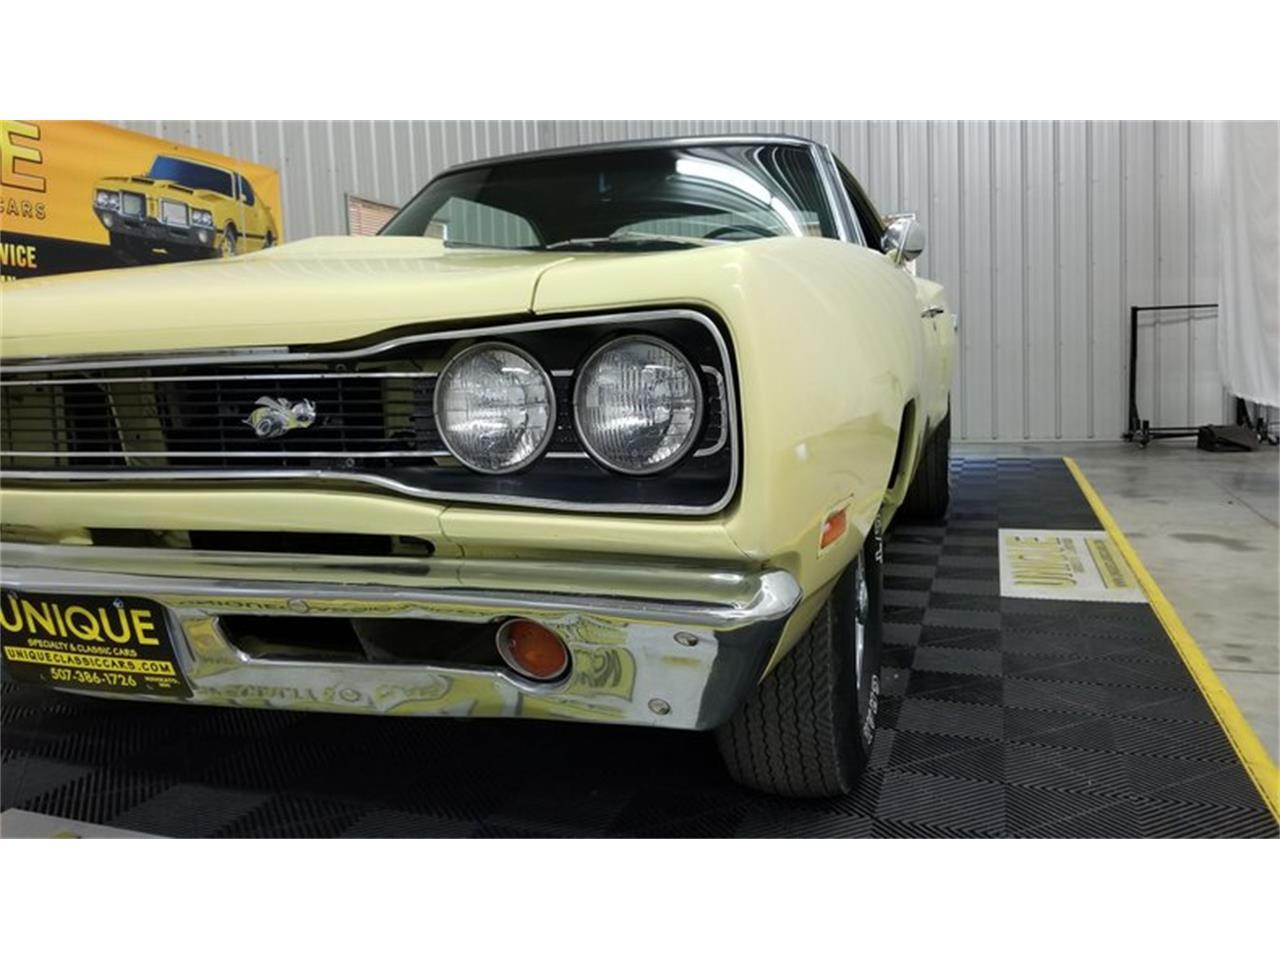 Large Picture of Classic '69 Super Bee located in Mankato Minnesota - $36,900.00 - QKOO